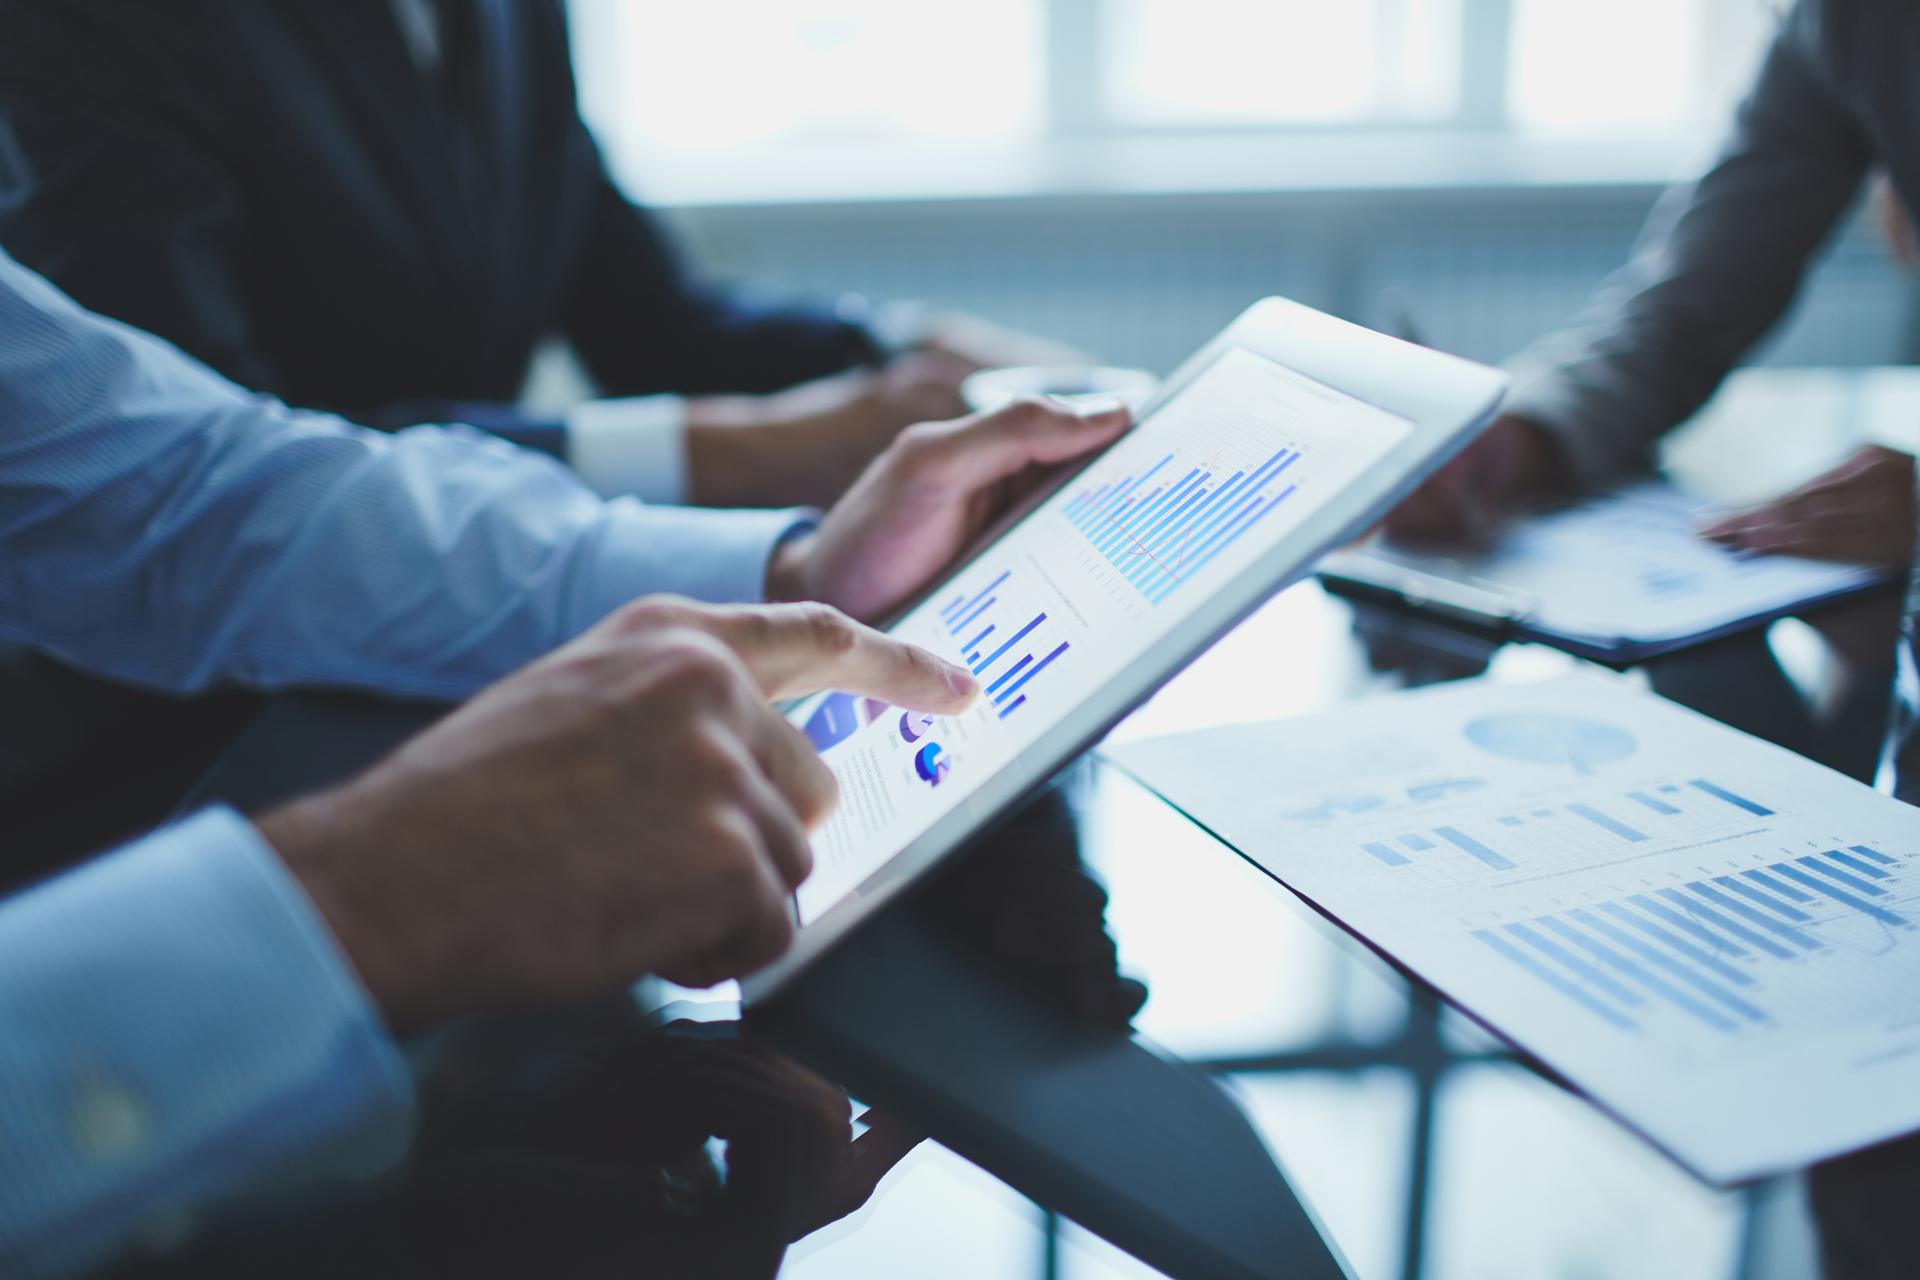 RuleDesigner Spare Parts | Customer Portal & Sales Order Process